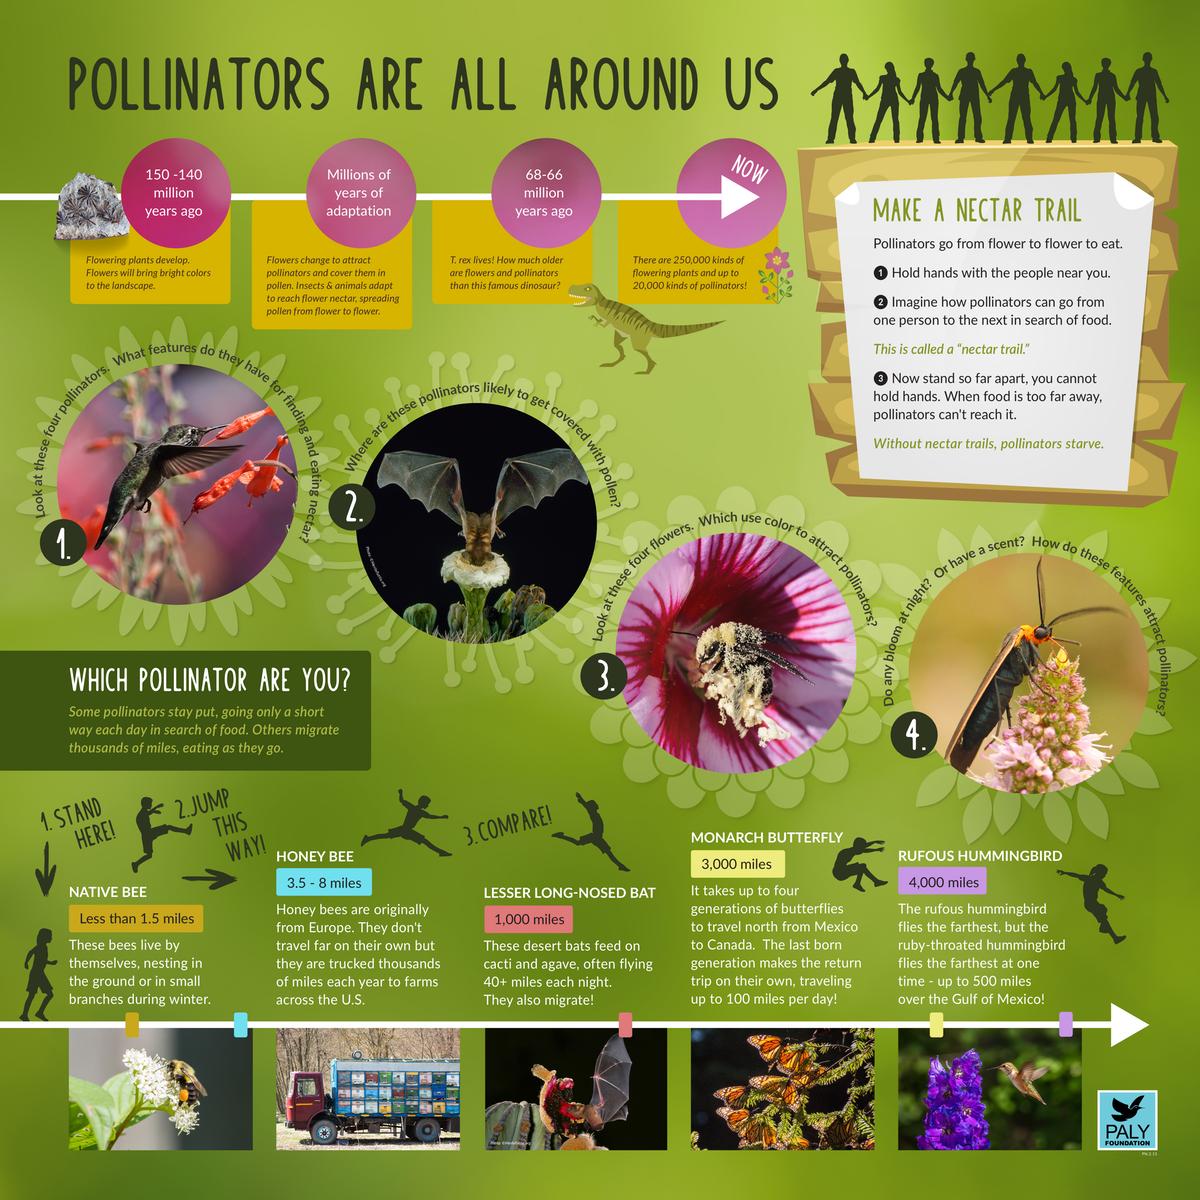 Pollinators - Paly Foundation Exhibit